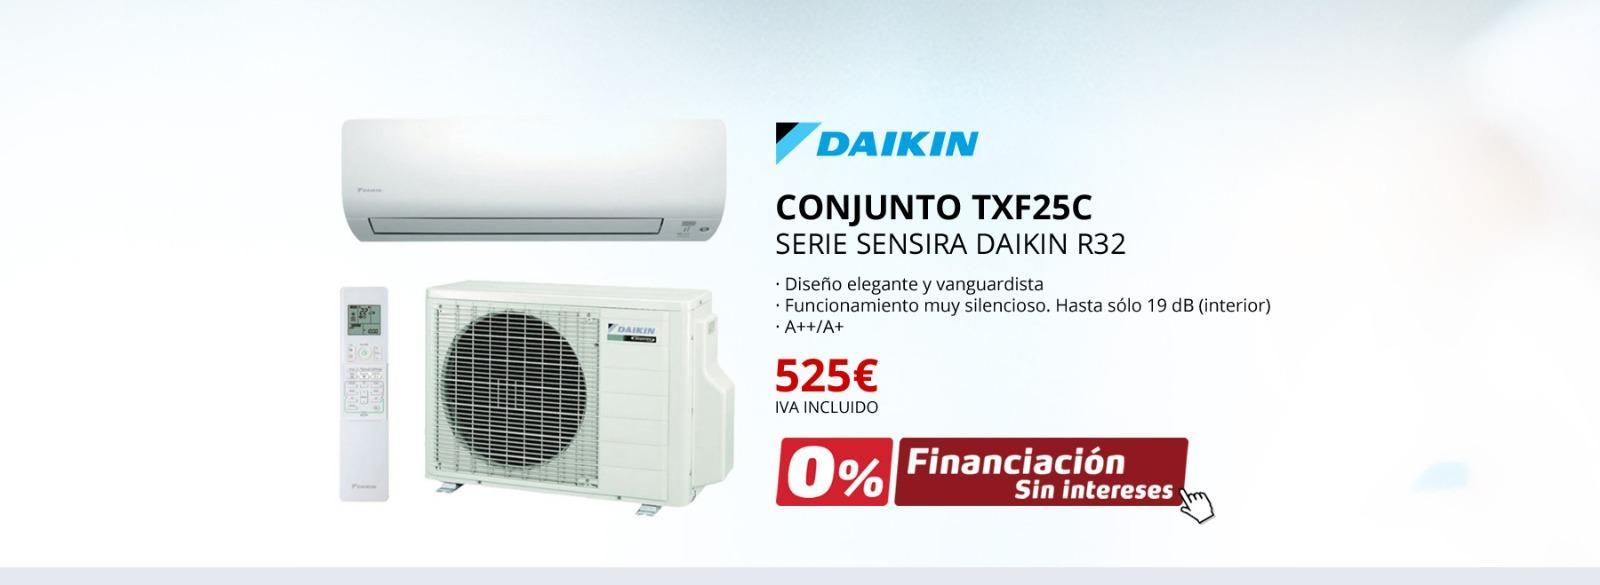 CONJUNTO TXF25C - SERIE SENSIRA DAIKIN R32